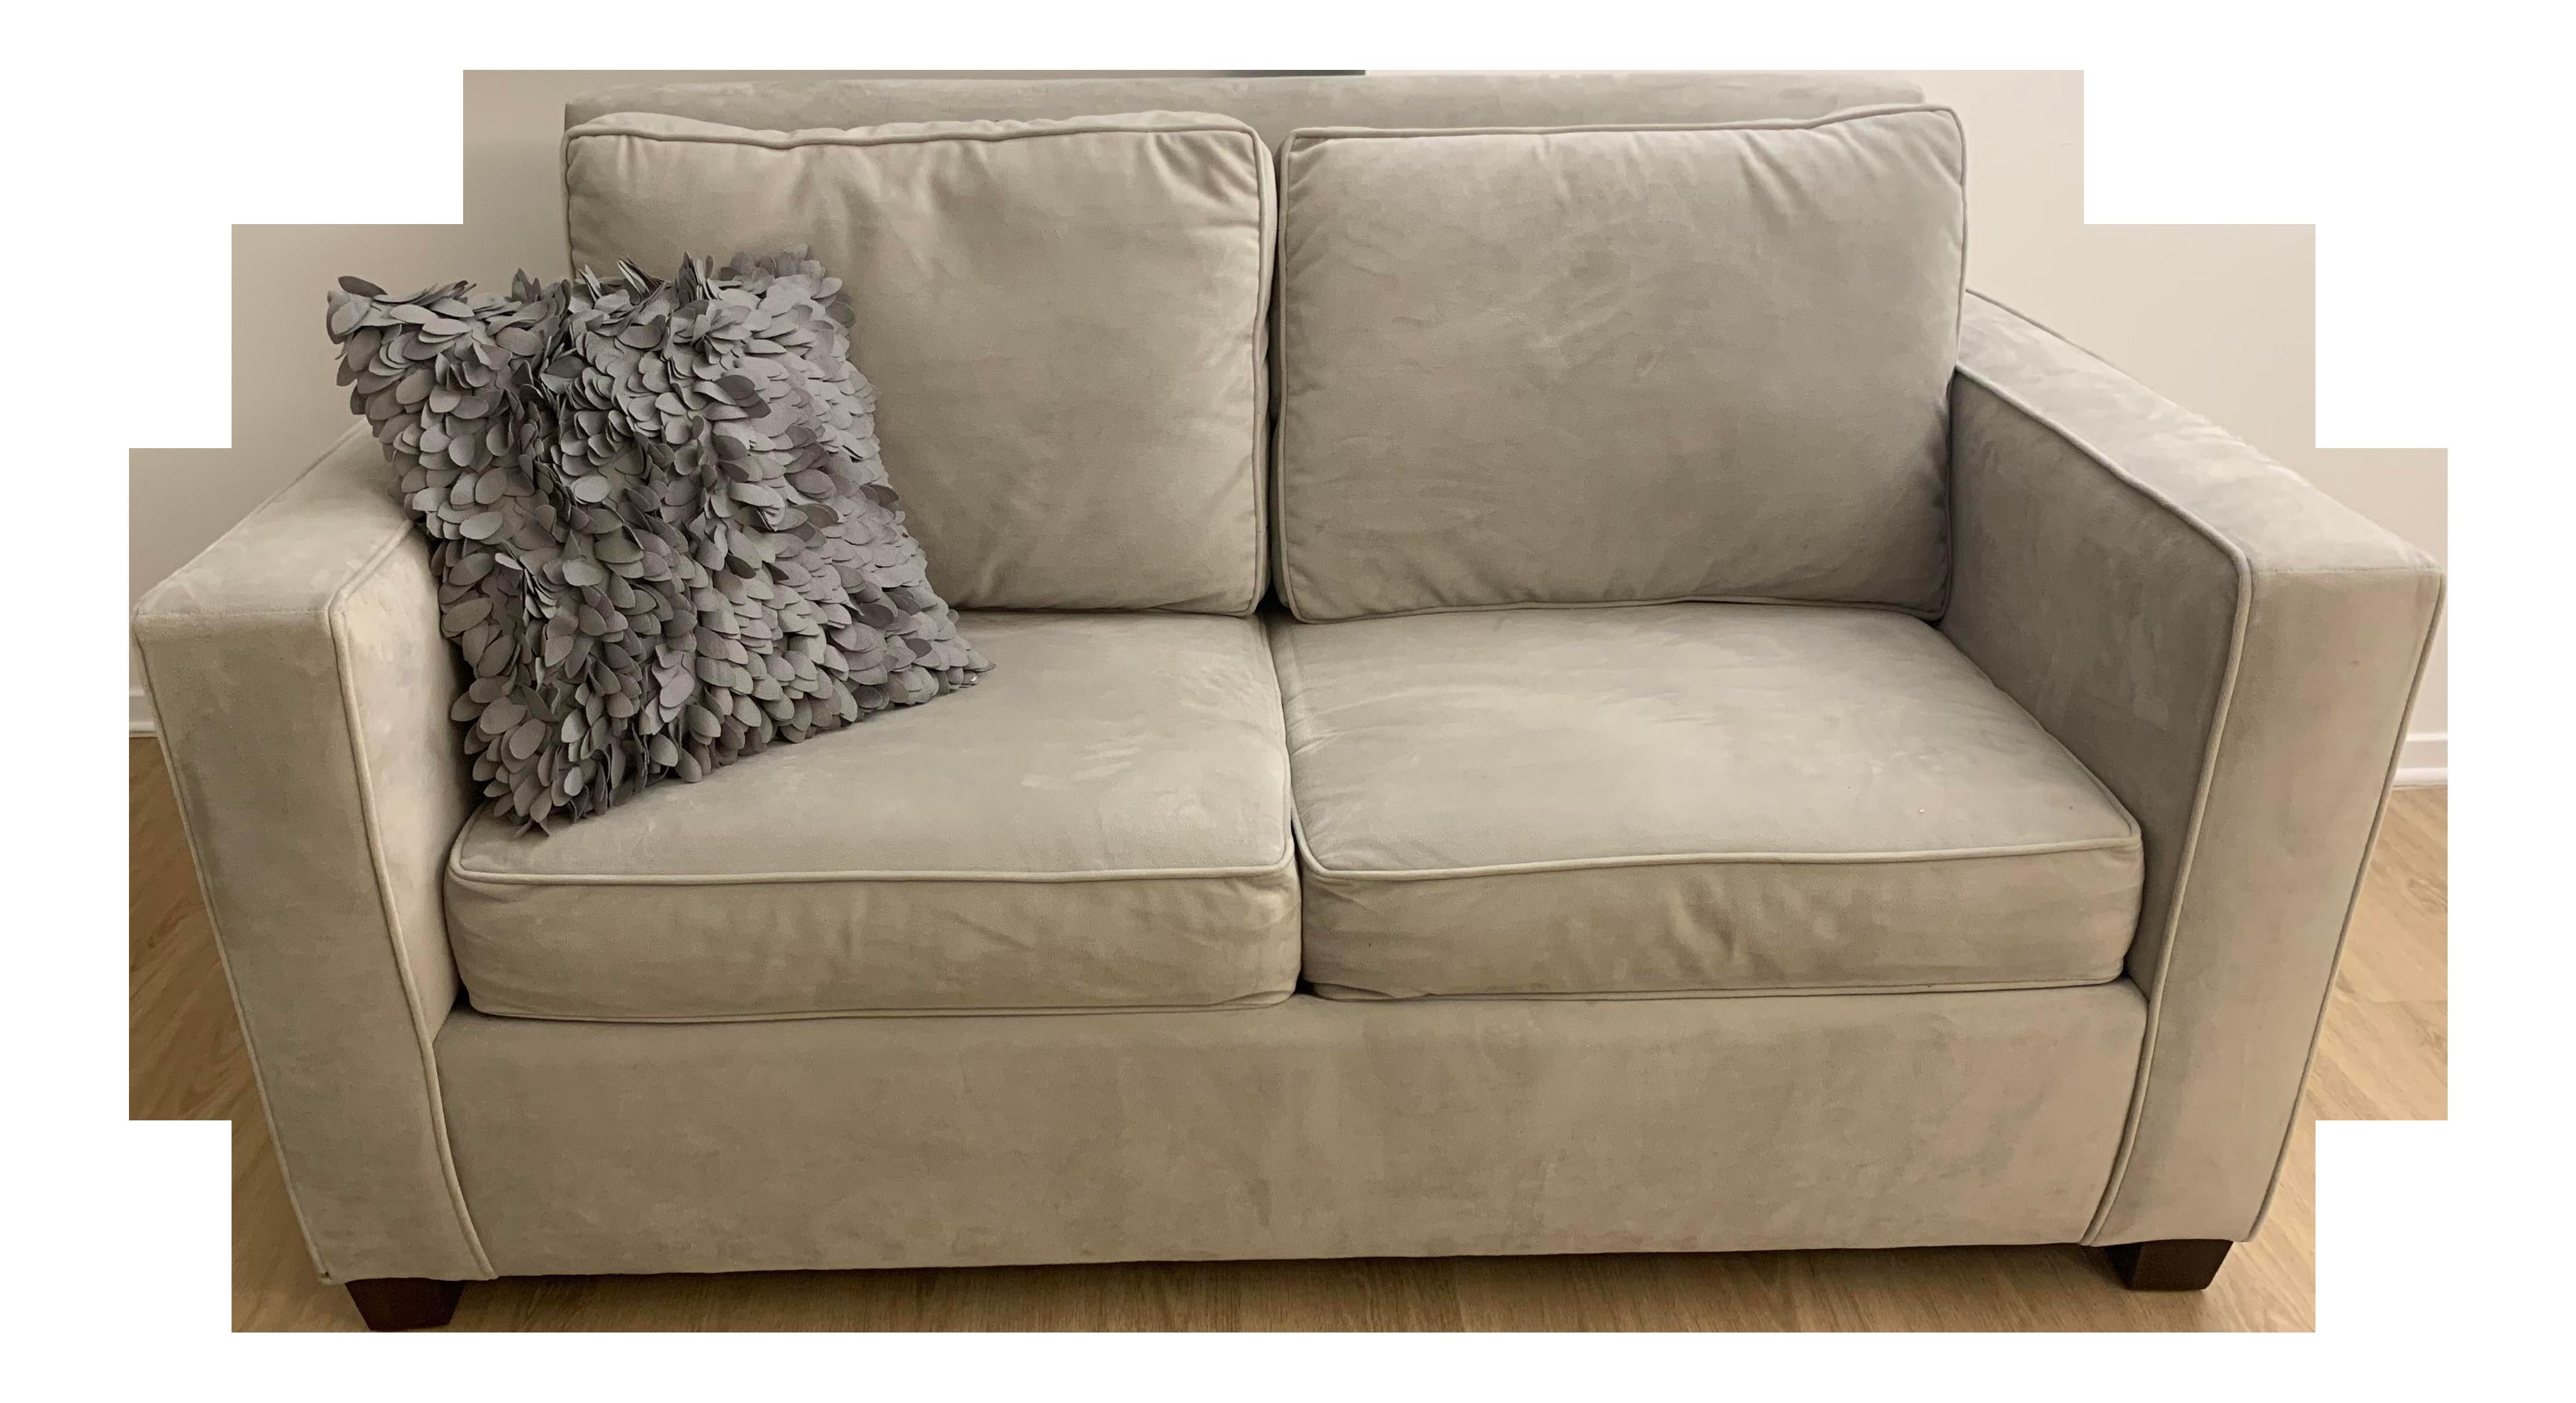 Prime West Elm Performance Velvet Loveseat Sleeper Sofa Beatyapartments Chair Design Images Beatyapartmentscom